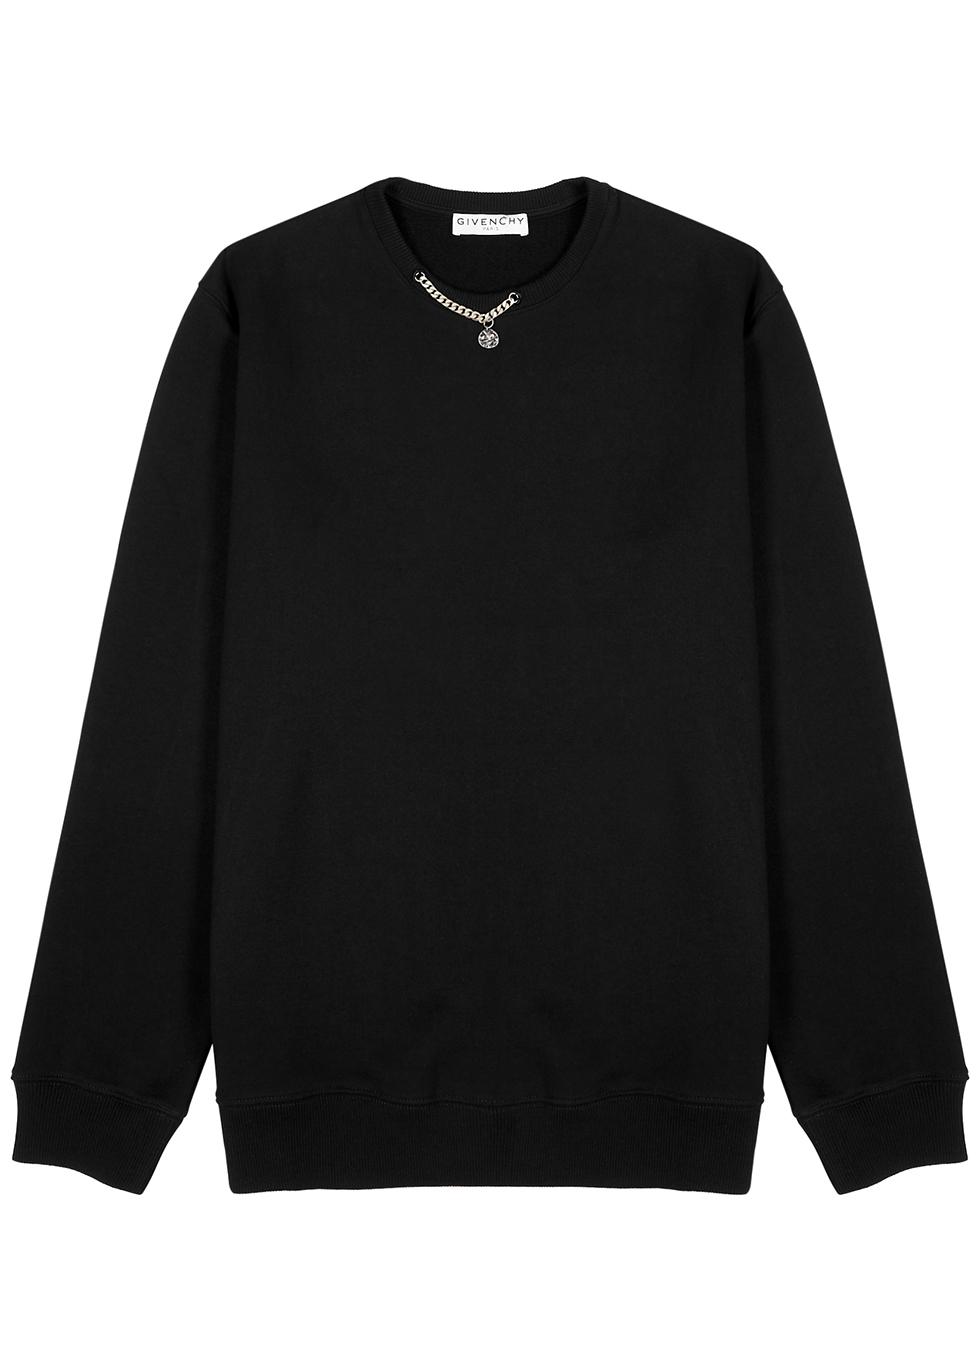 Black chain-embellished cotton sweatshirt